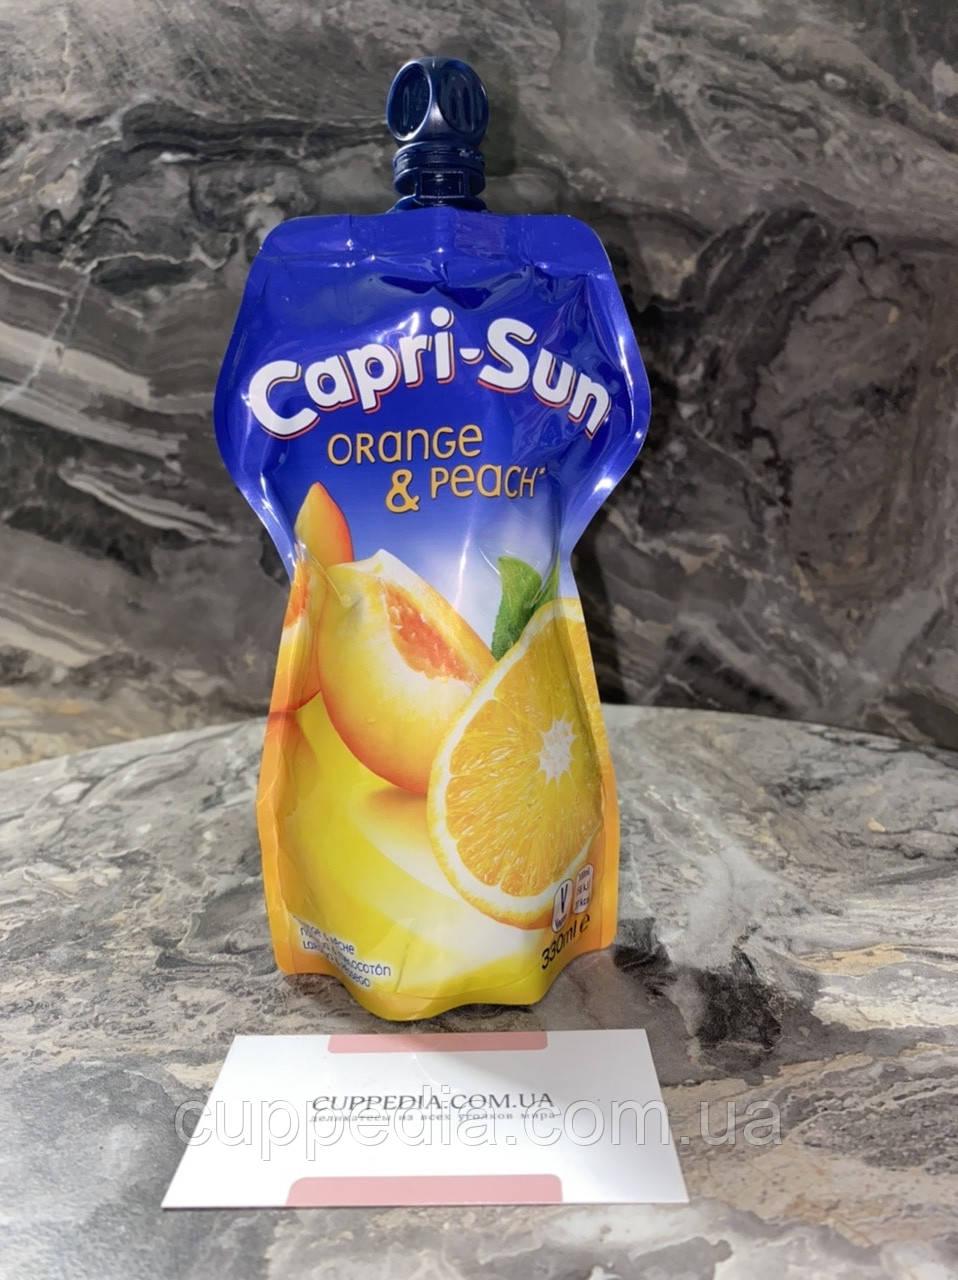 Сік Capri - Sun Multi Orance & Peach апельсин з персиком 330 мл